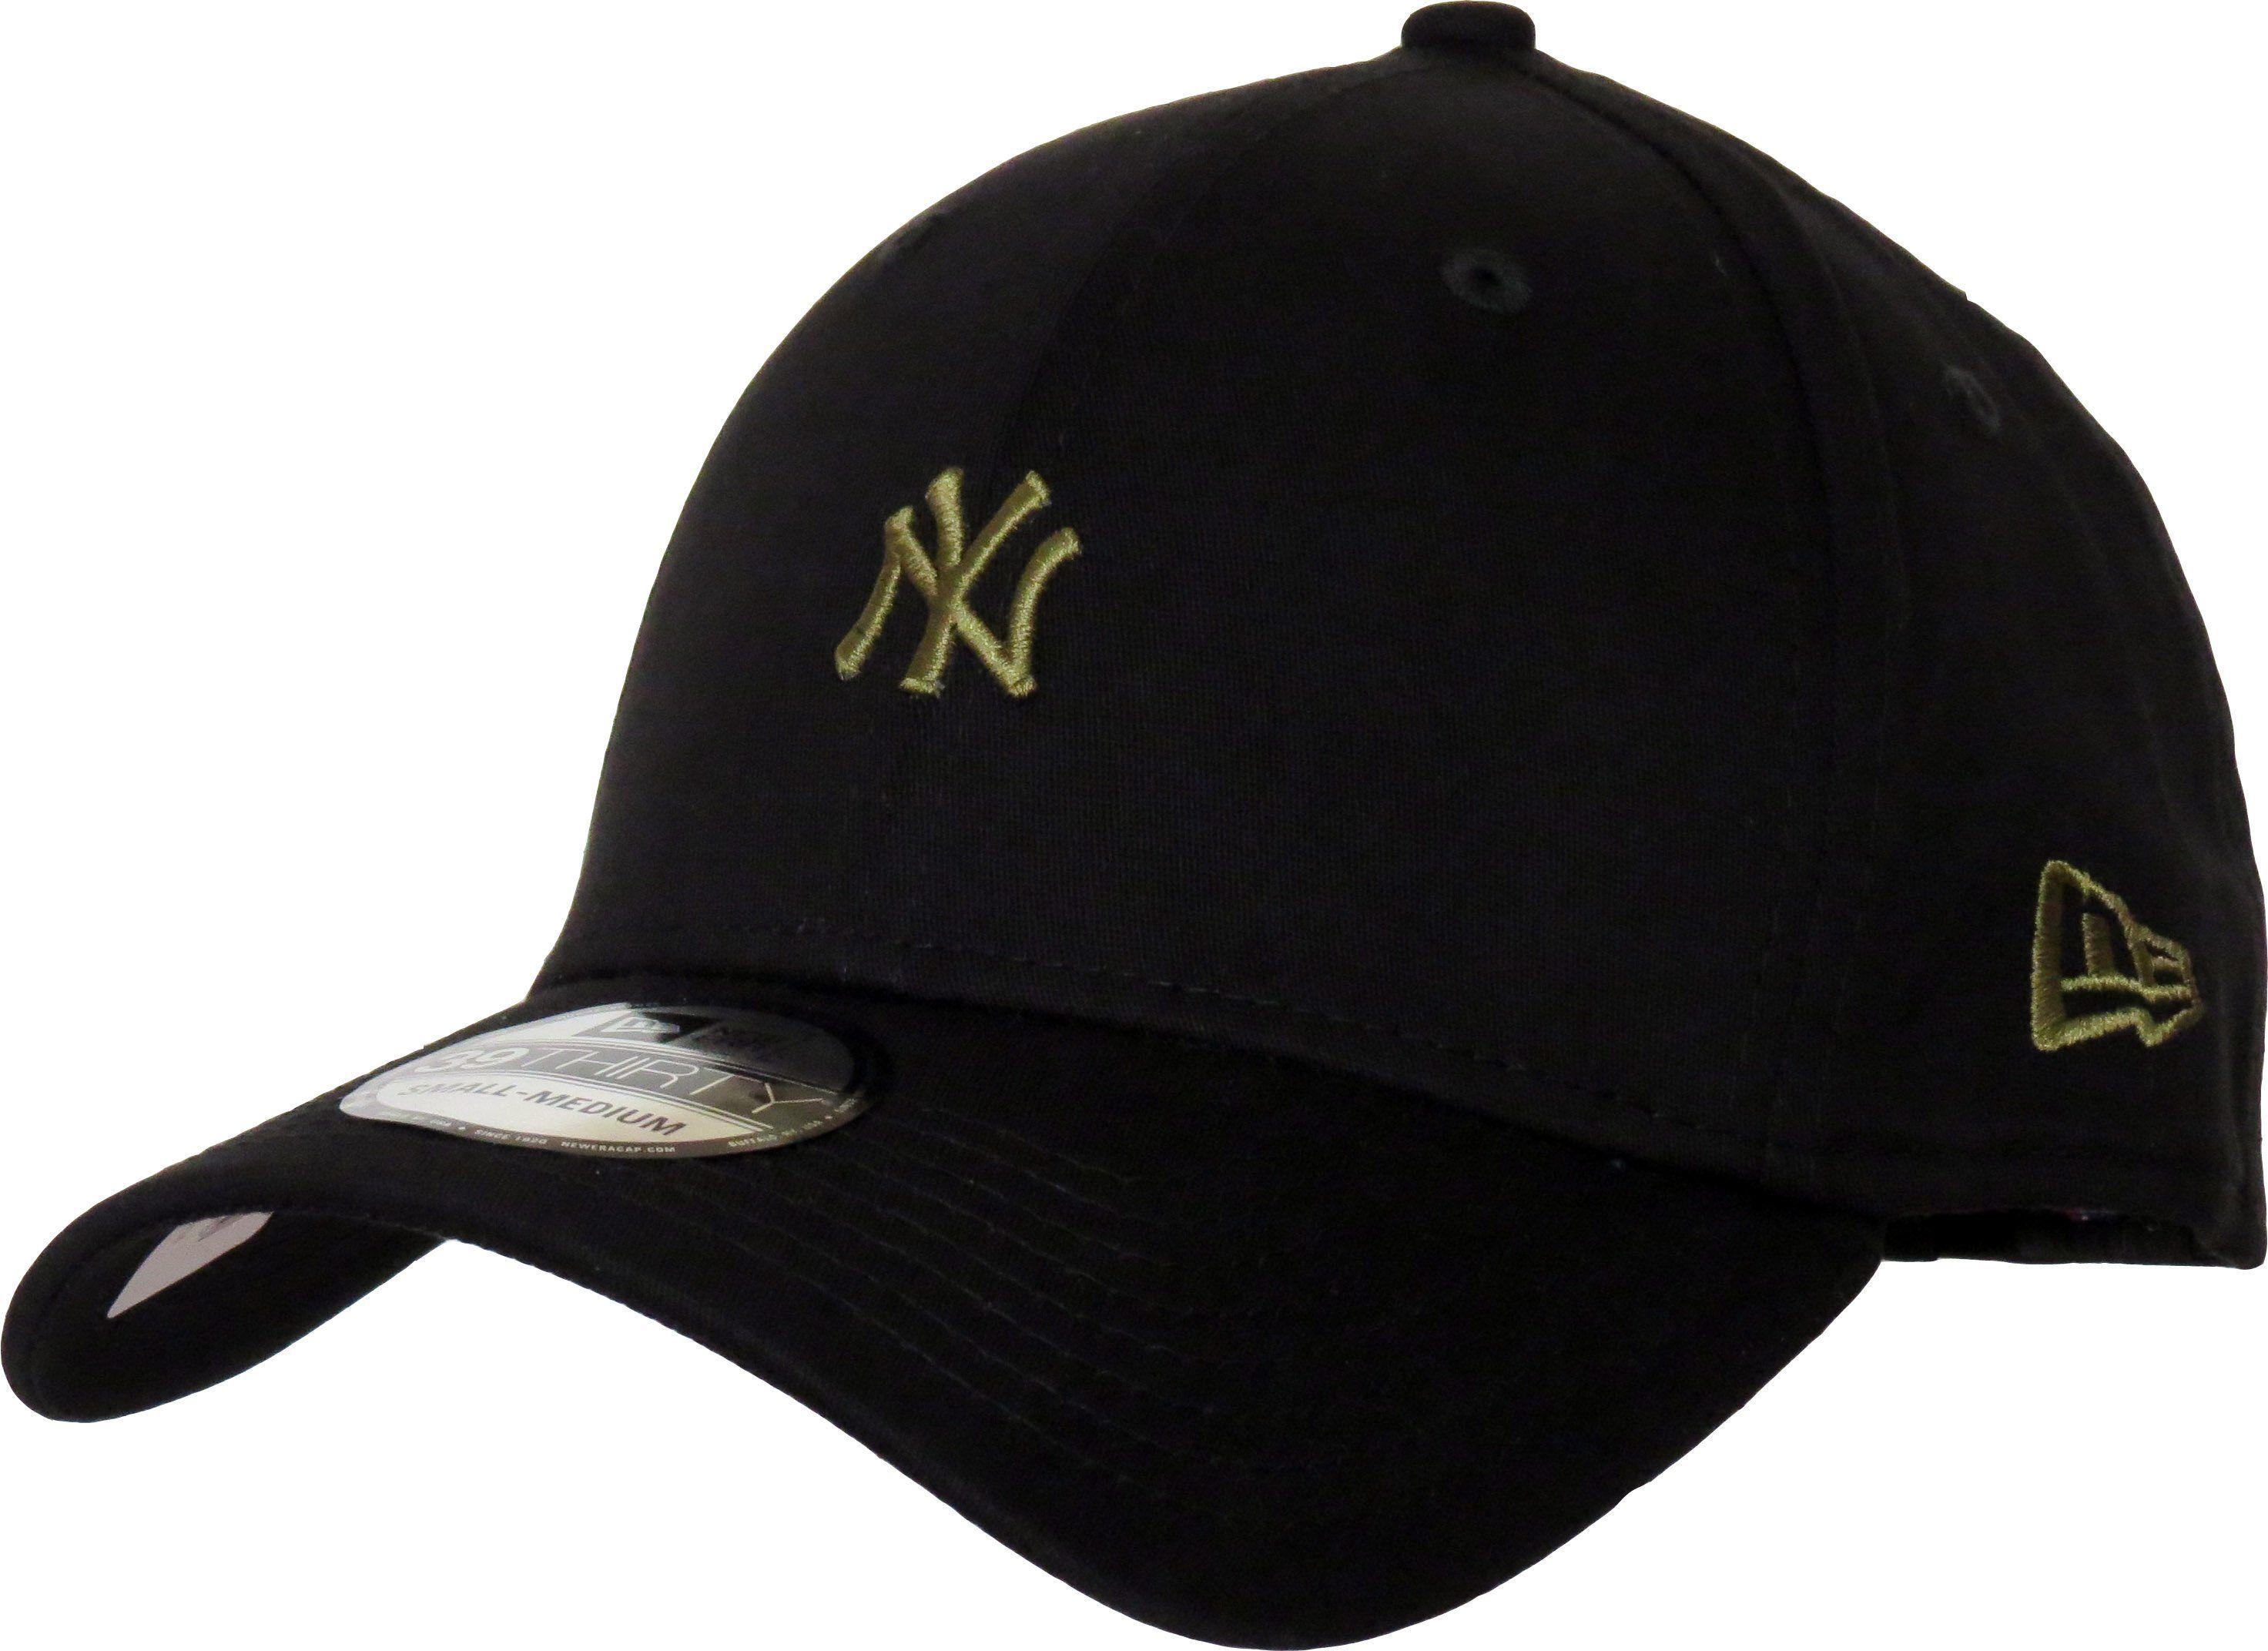 7b84053b7ffb5 New Era 39Thirty MLB Mini Logo Stretch Fit Baseball Cap. Black